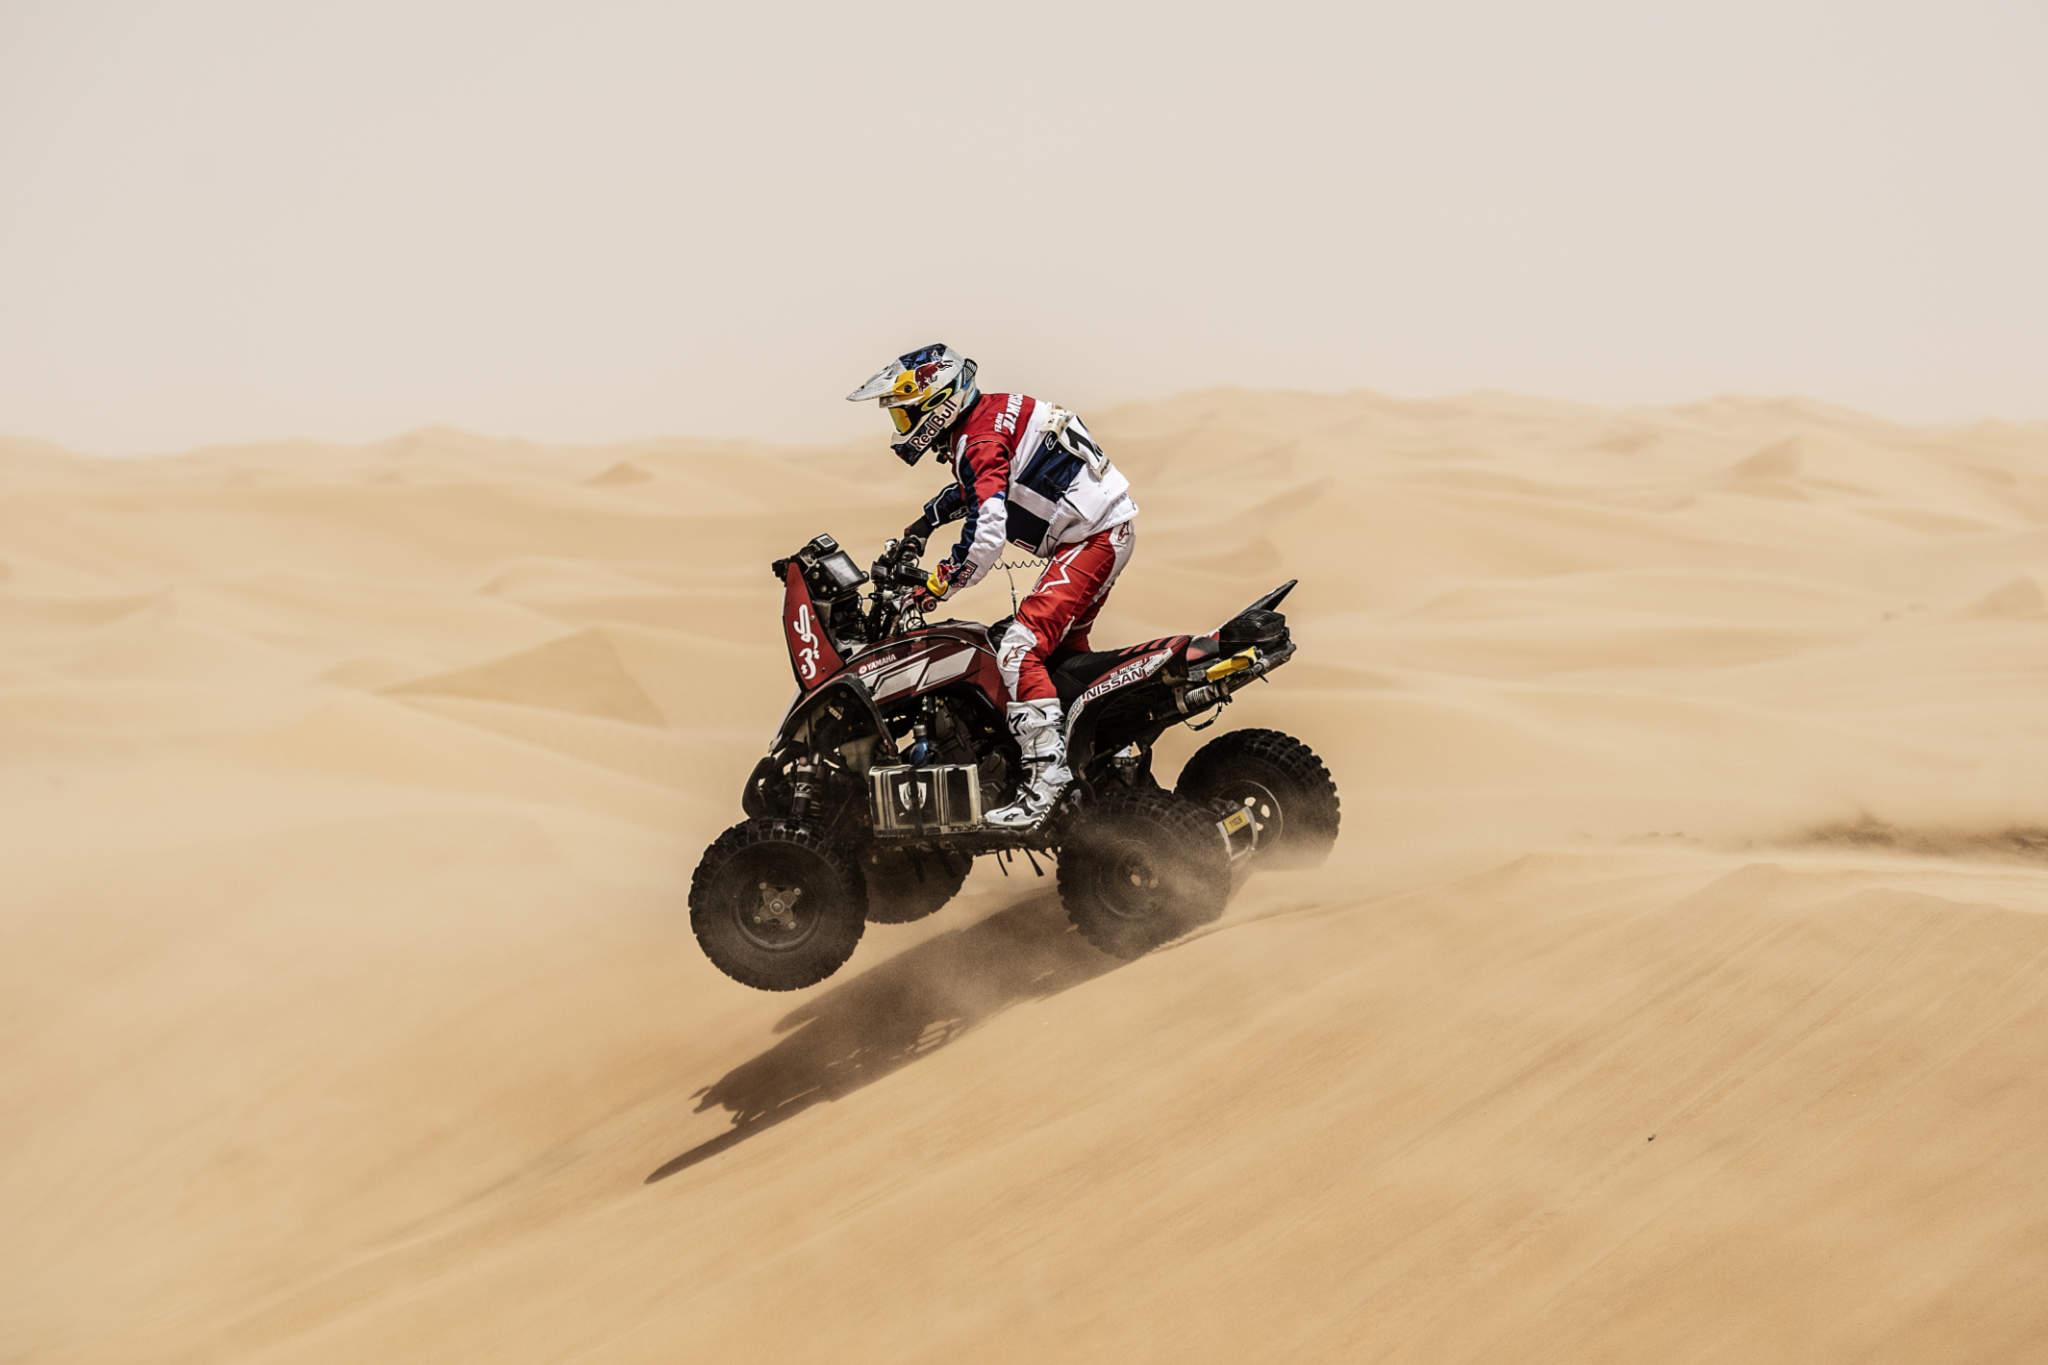 Fahad Al Musallam, Abu Dhabi Desert Challenge 2019